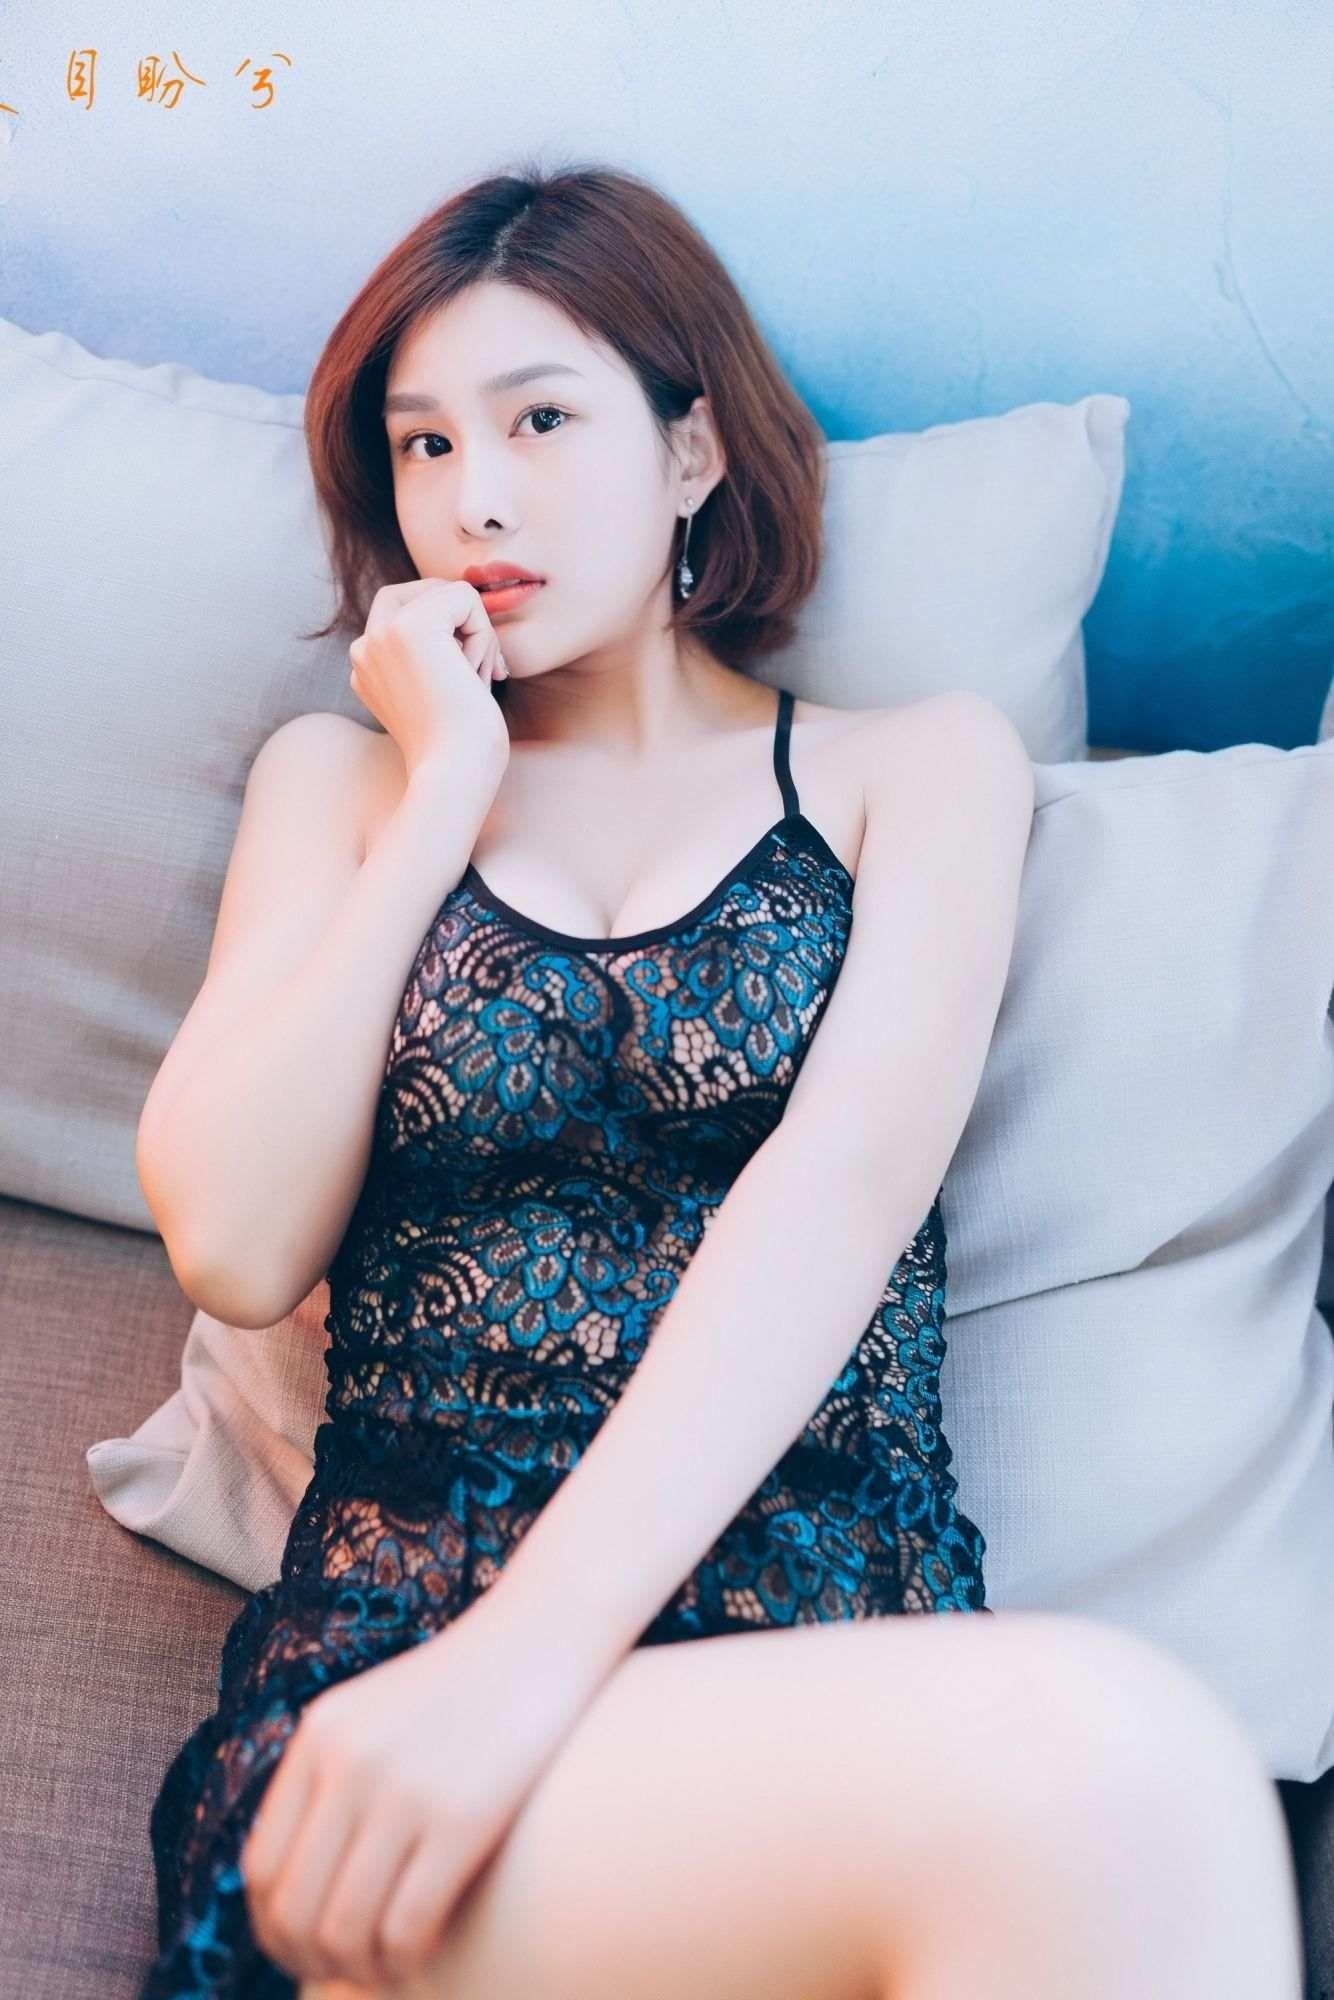 闫盼盼旗袍女神610枚and闫盼盼 Nude